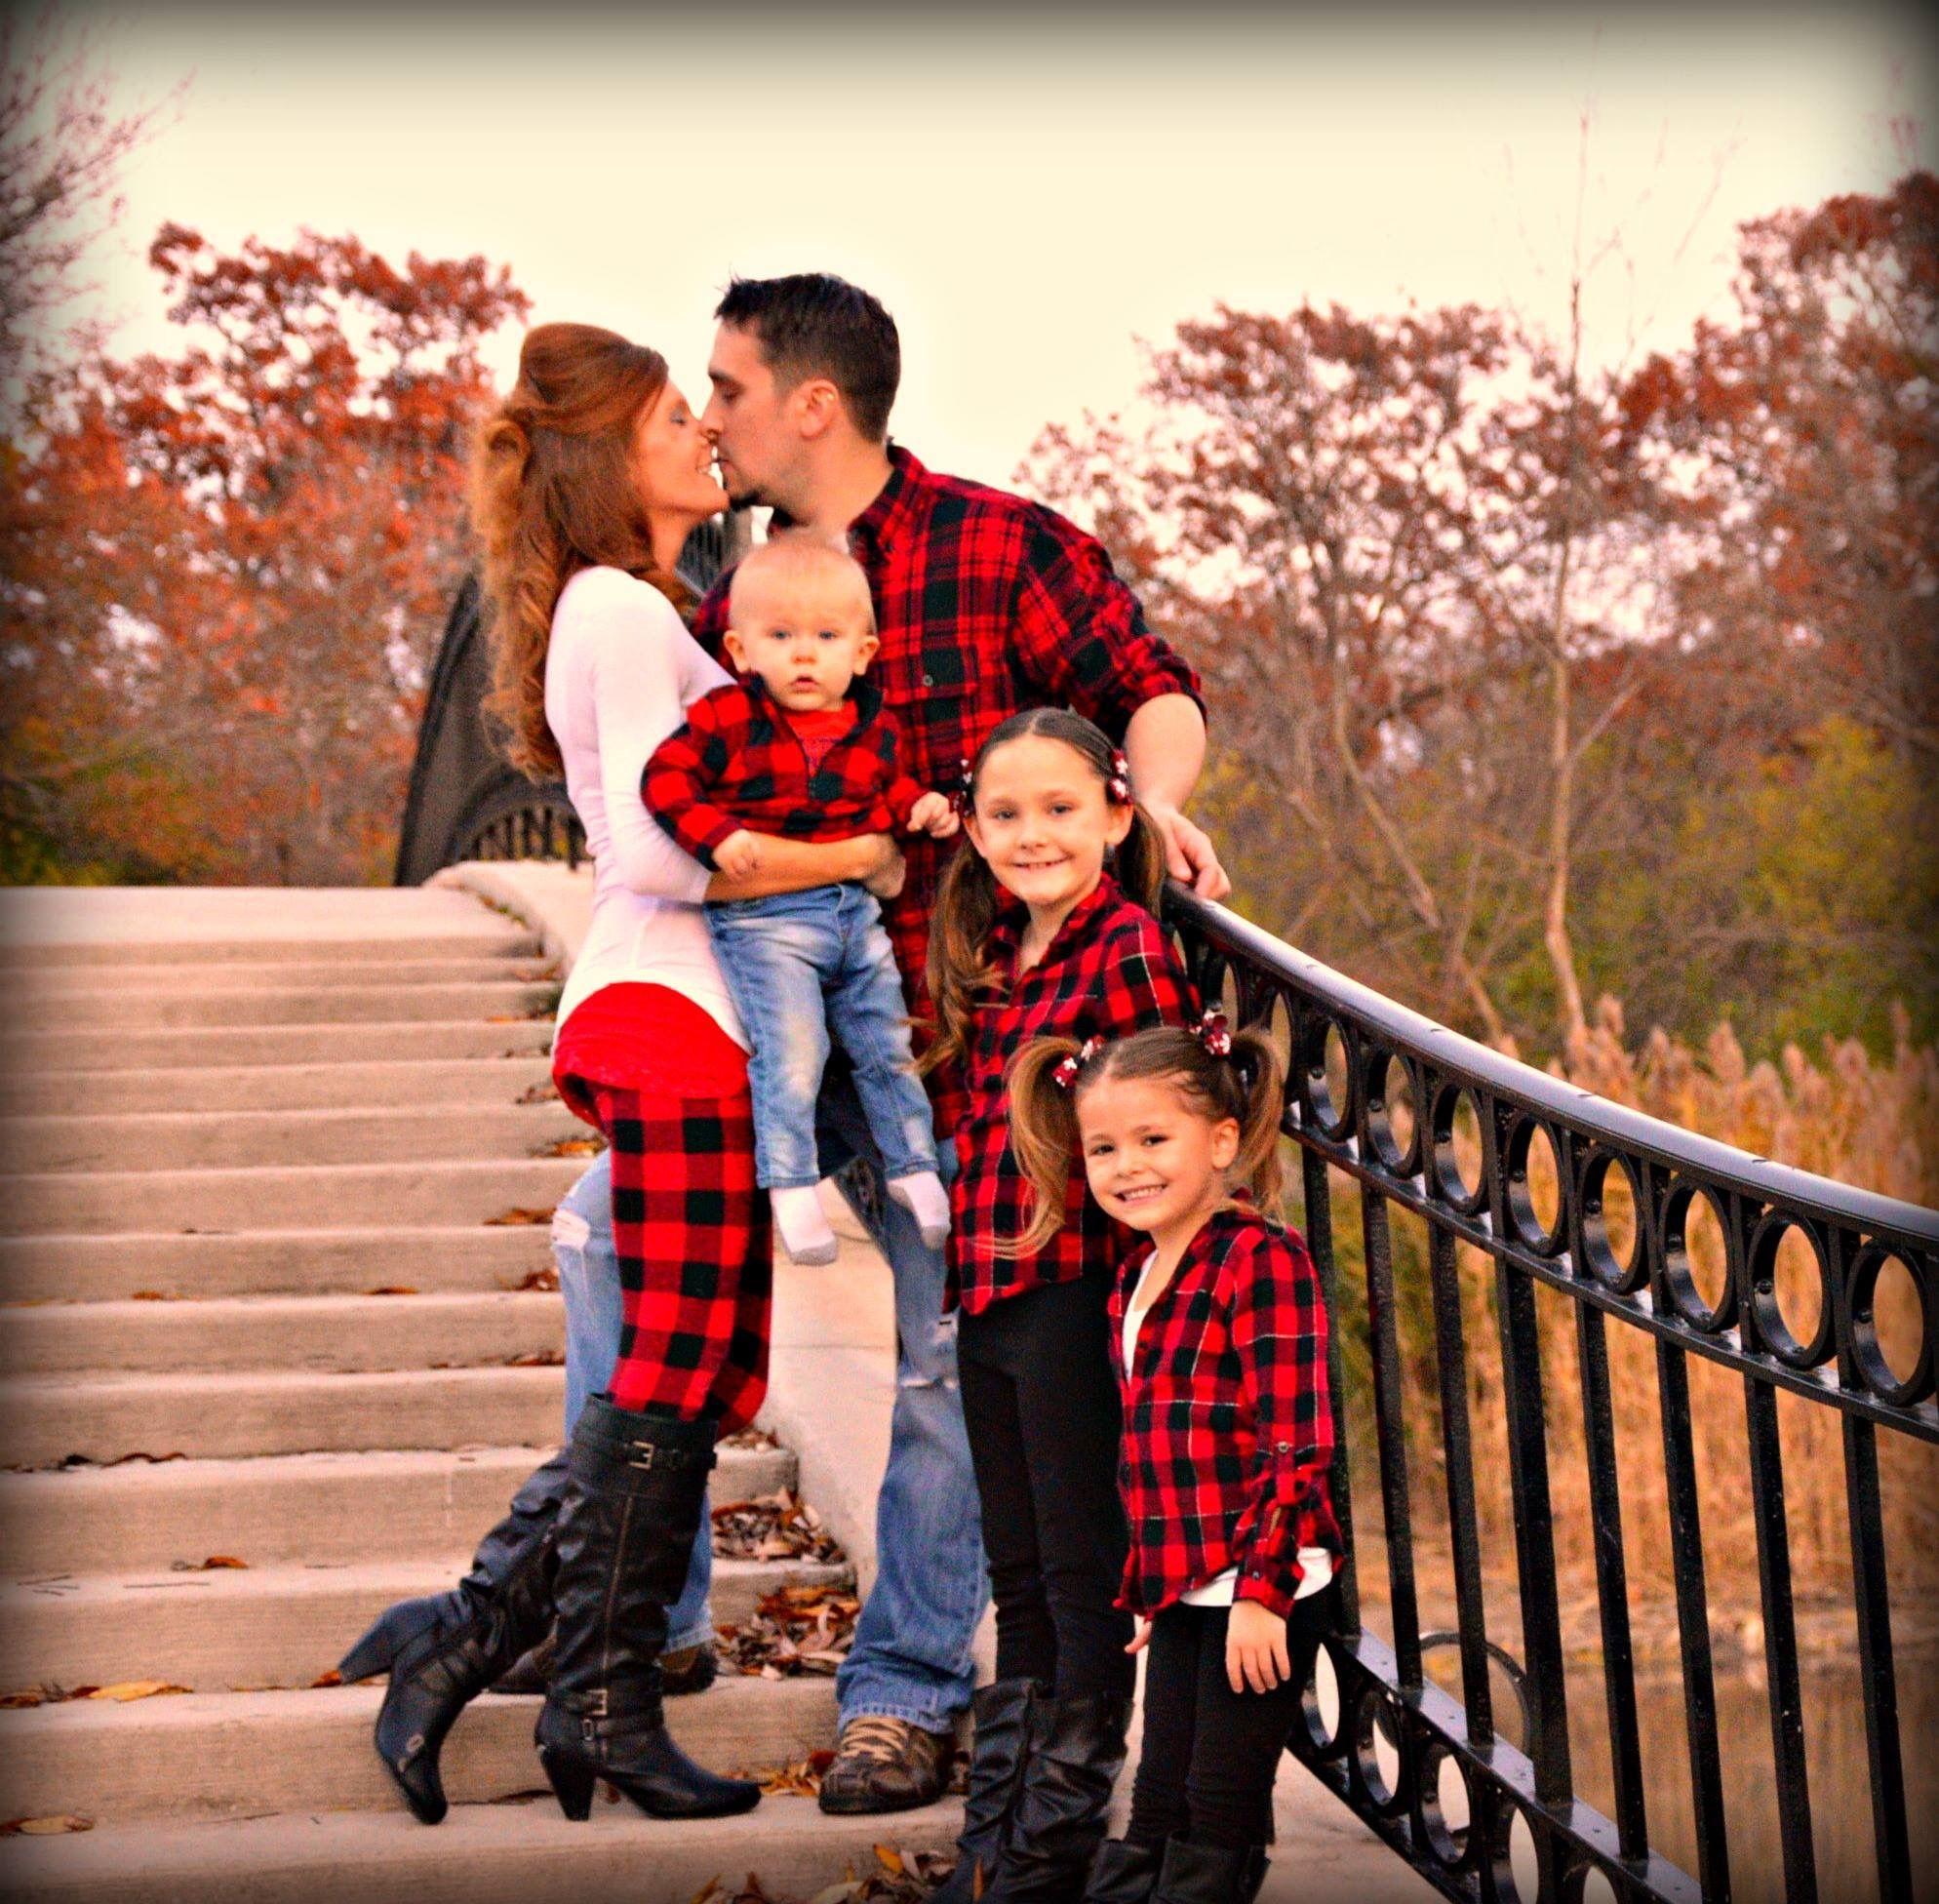 Family Christmas Card Photo Shoot Ideas Black Red Plaid